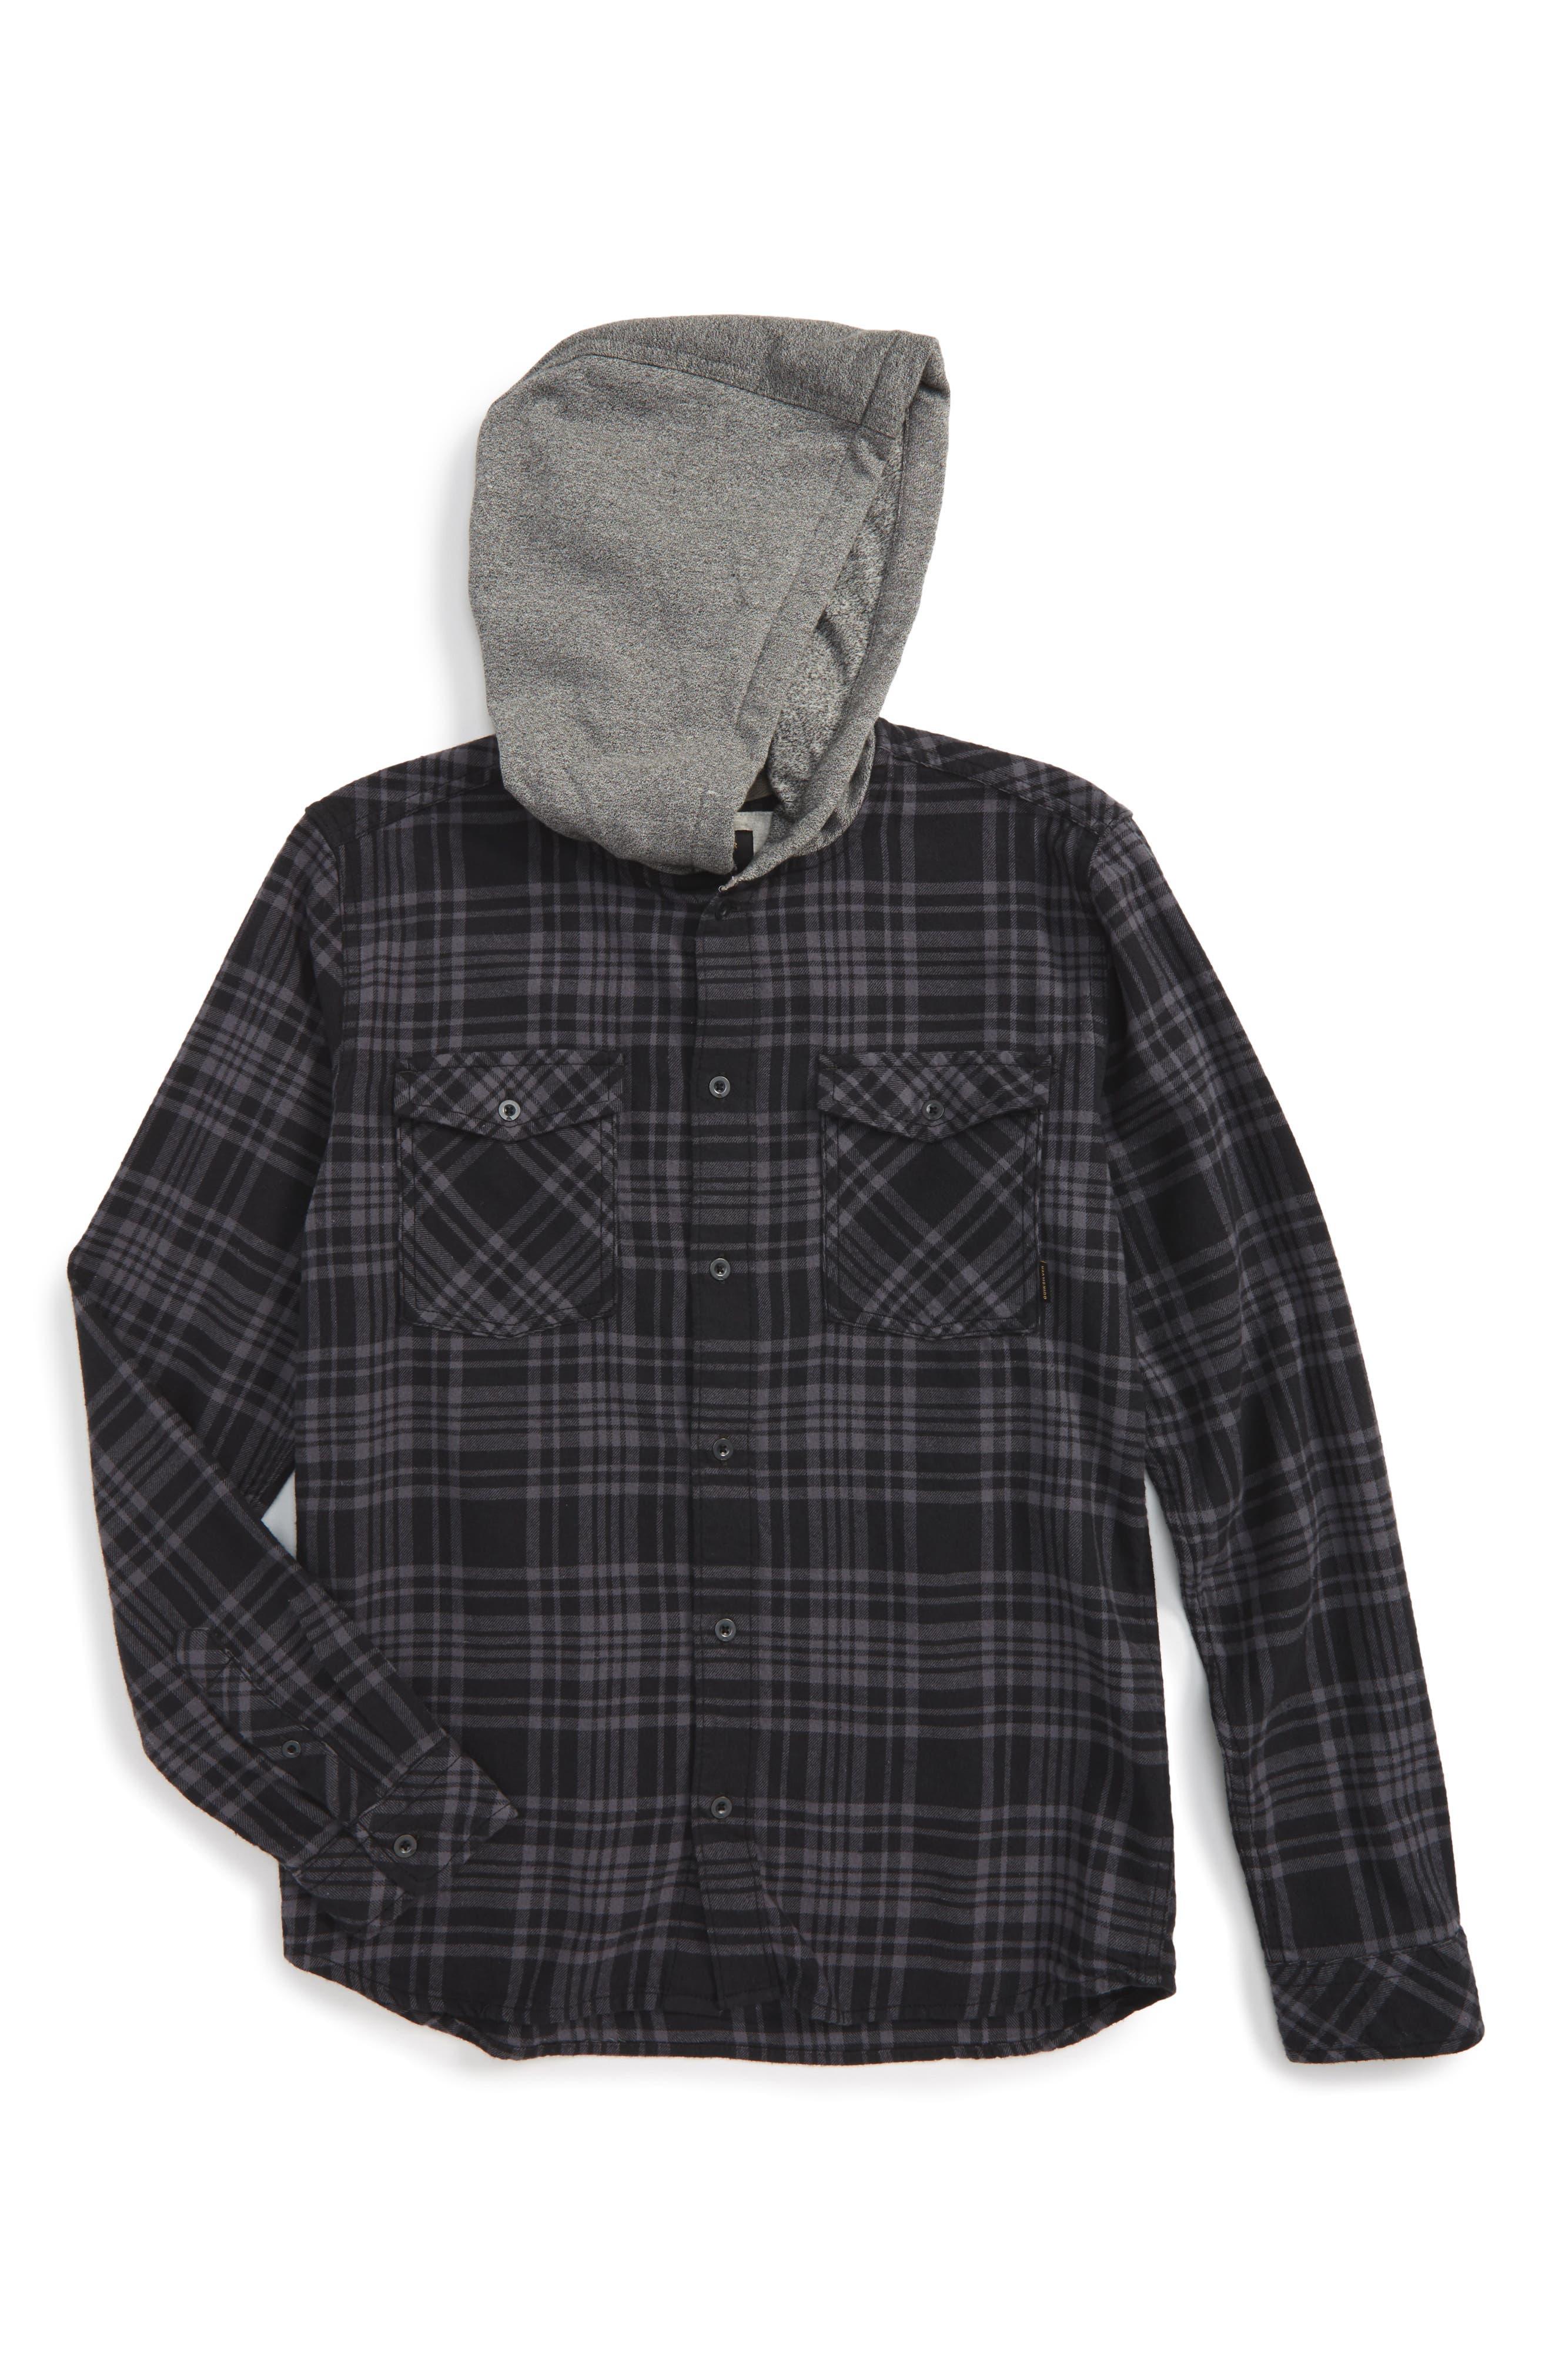 Quiksilver Hooded Plaid Woven Shirt (Toddler Boys, Little Boys & Big Boys)